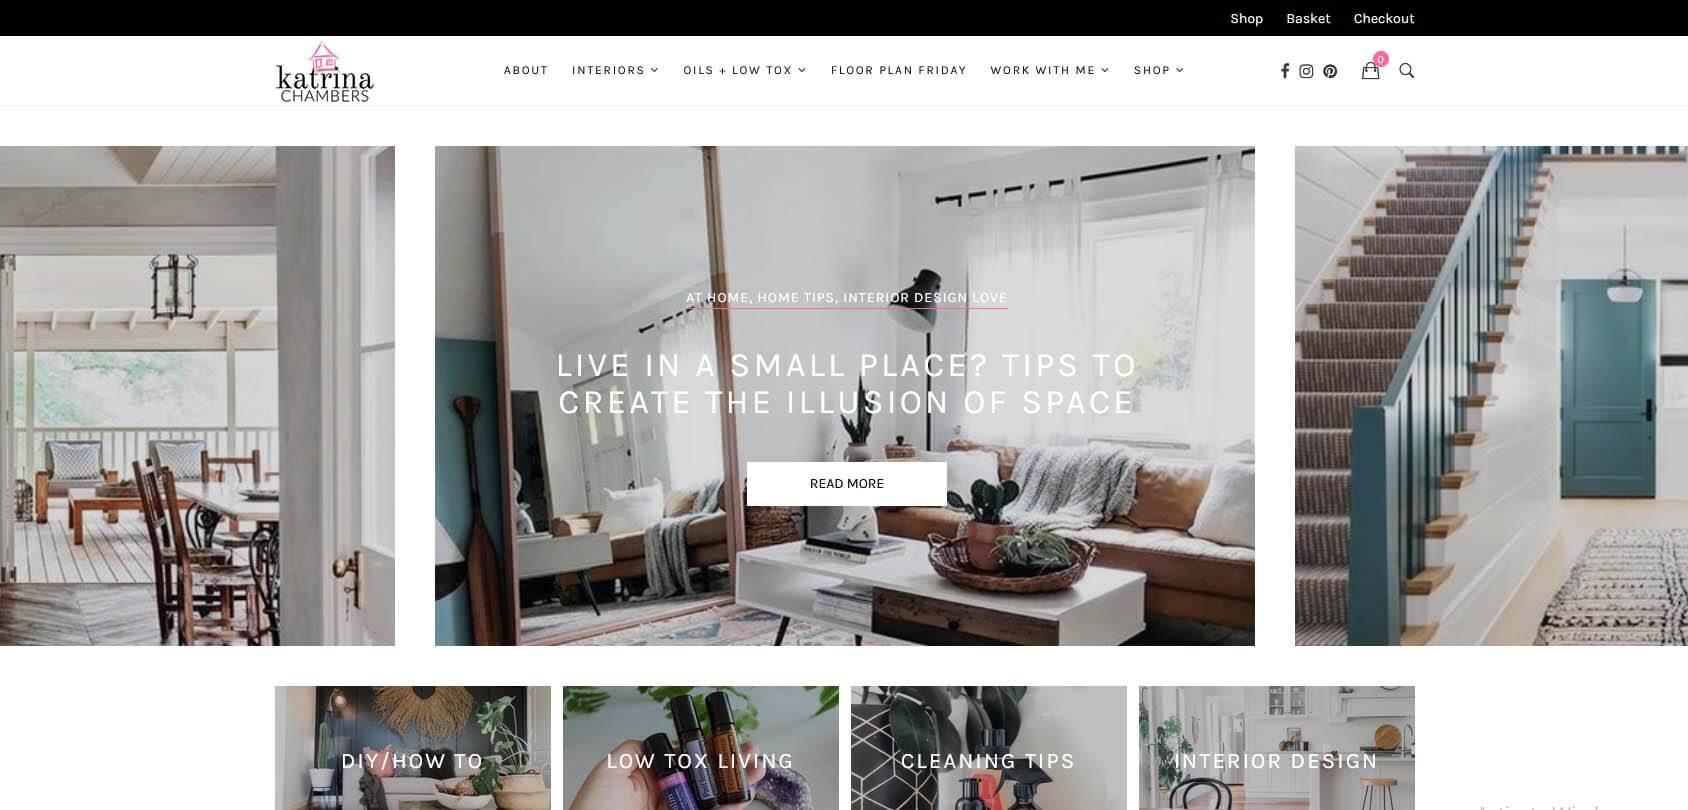 Katrina Chambers Homepage